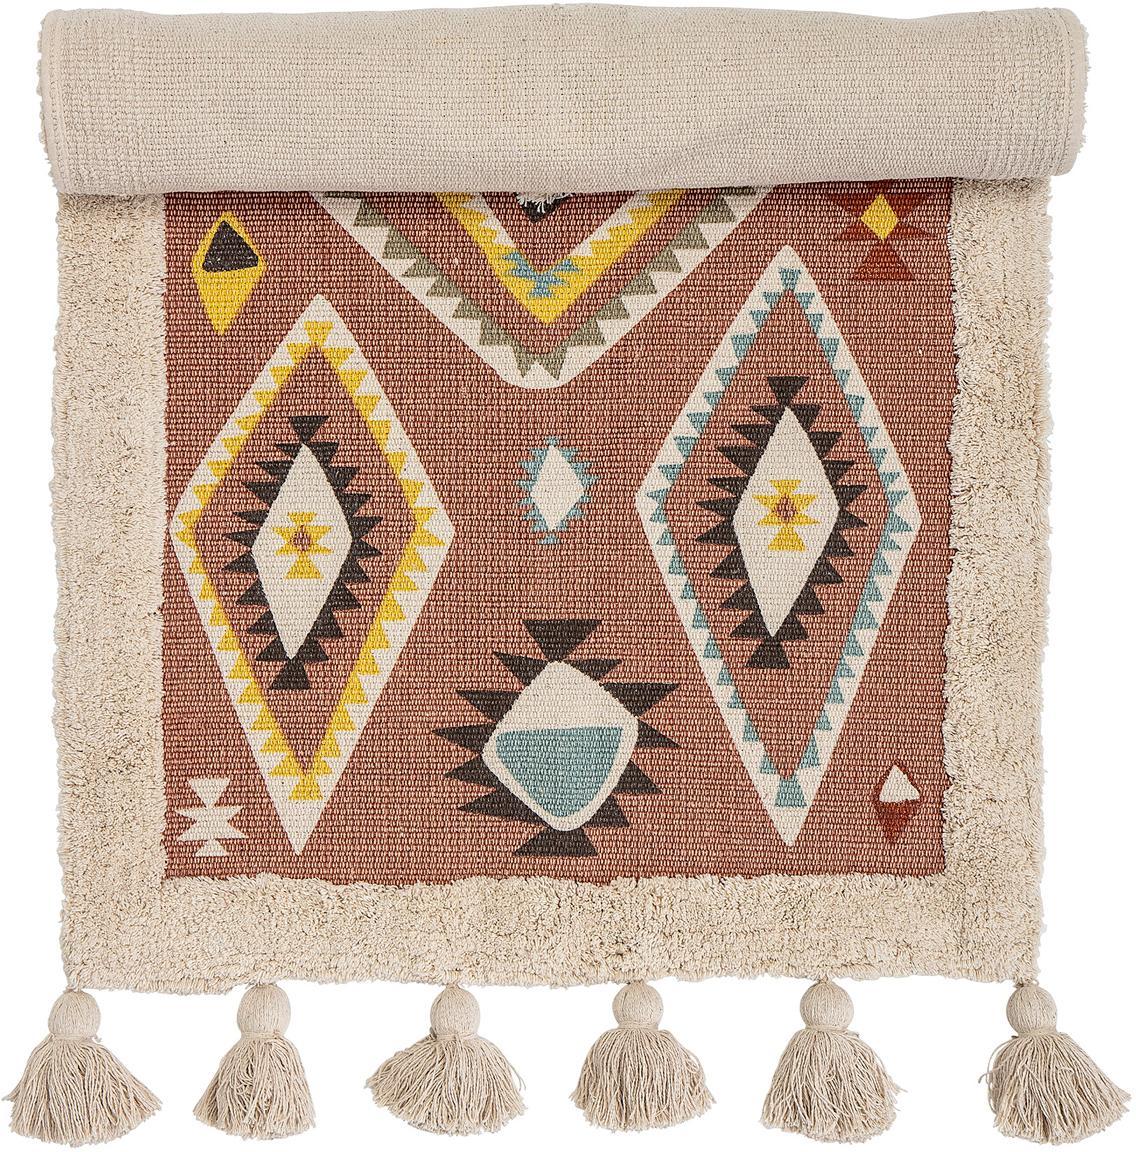 Teppich Boho, 100% Baumwolle, Mehrfarbig, B 65 x L 120 cm (Grösse XS)